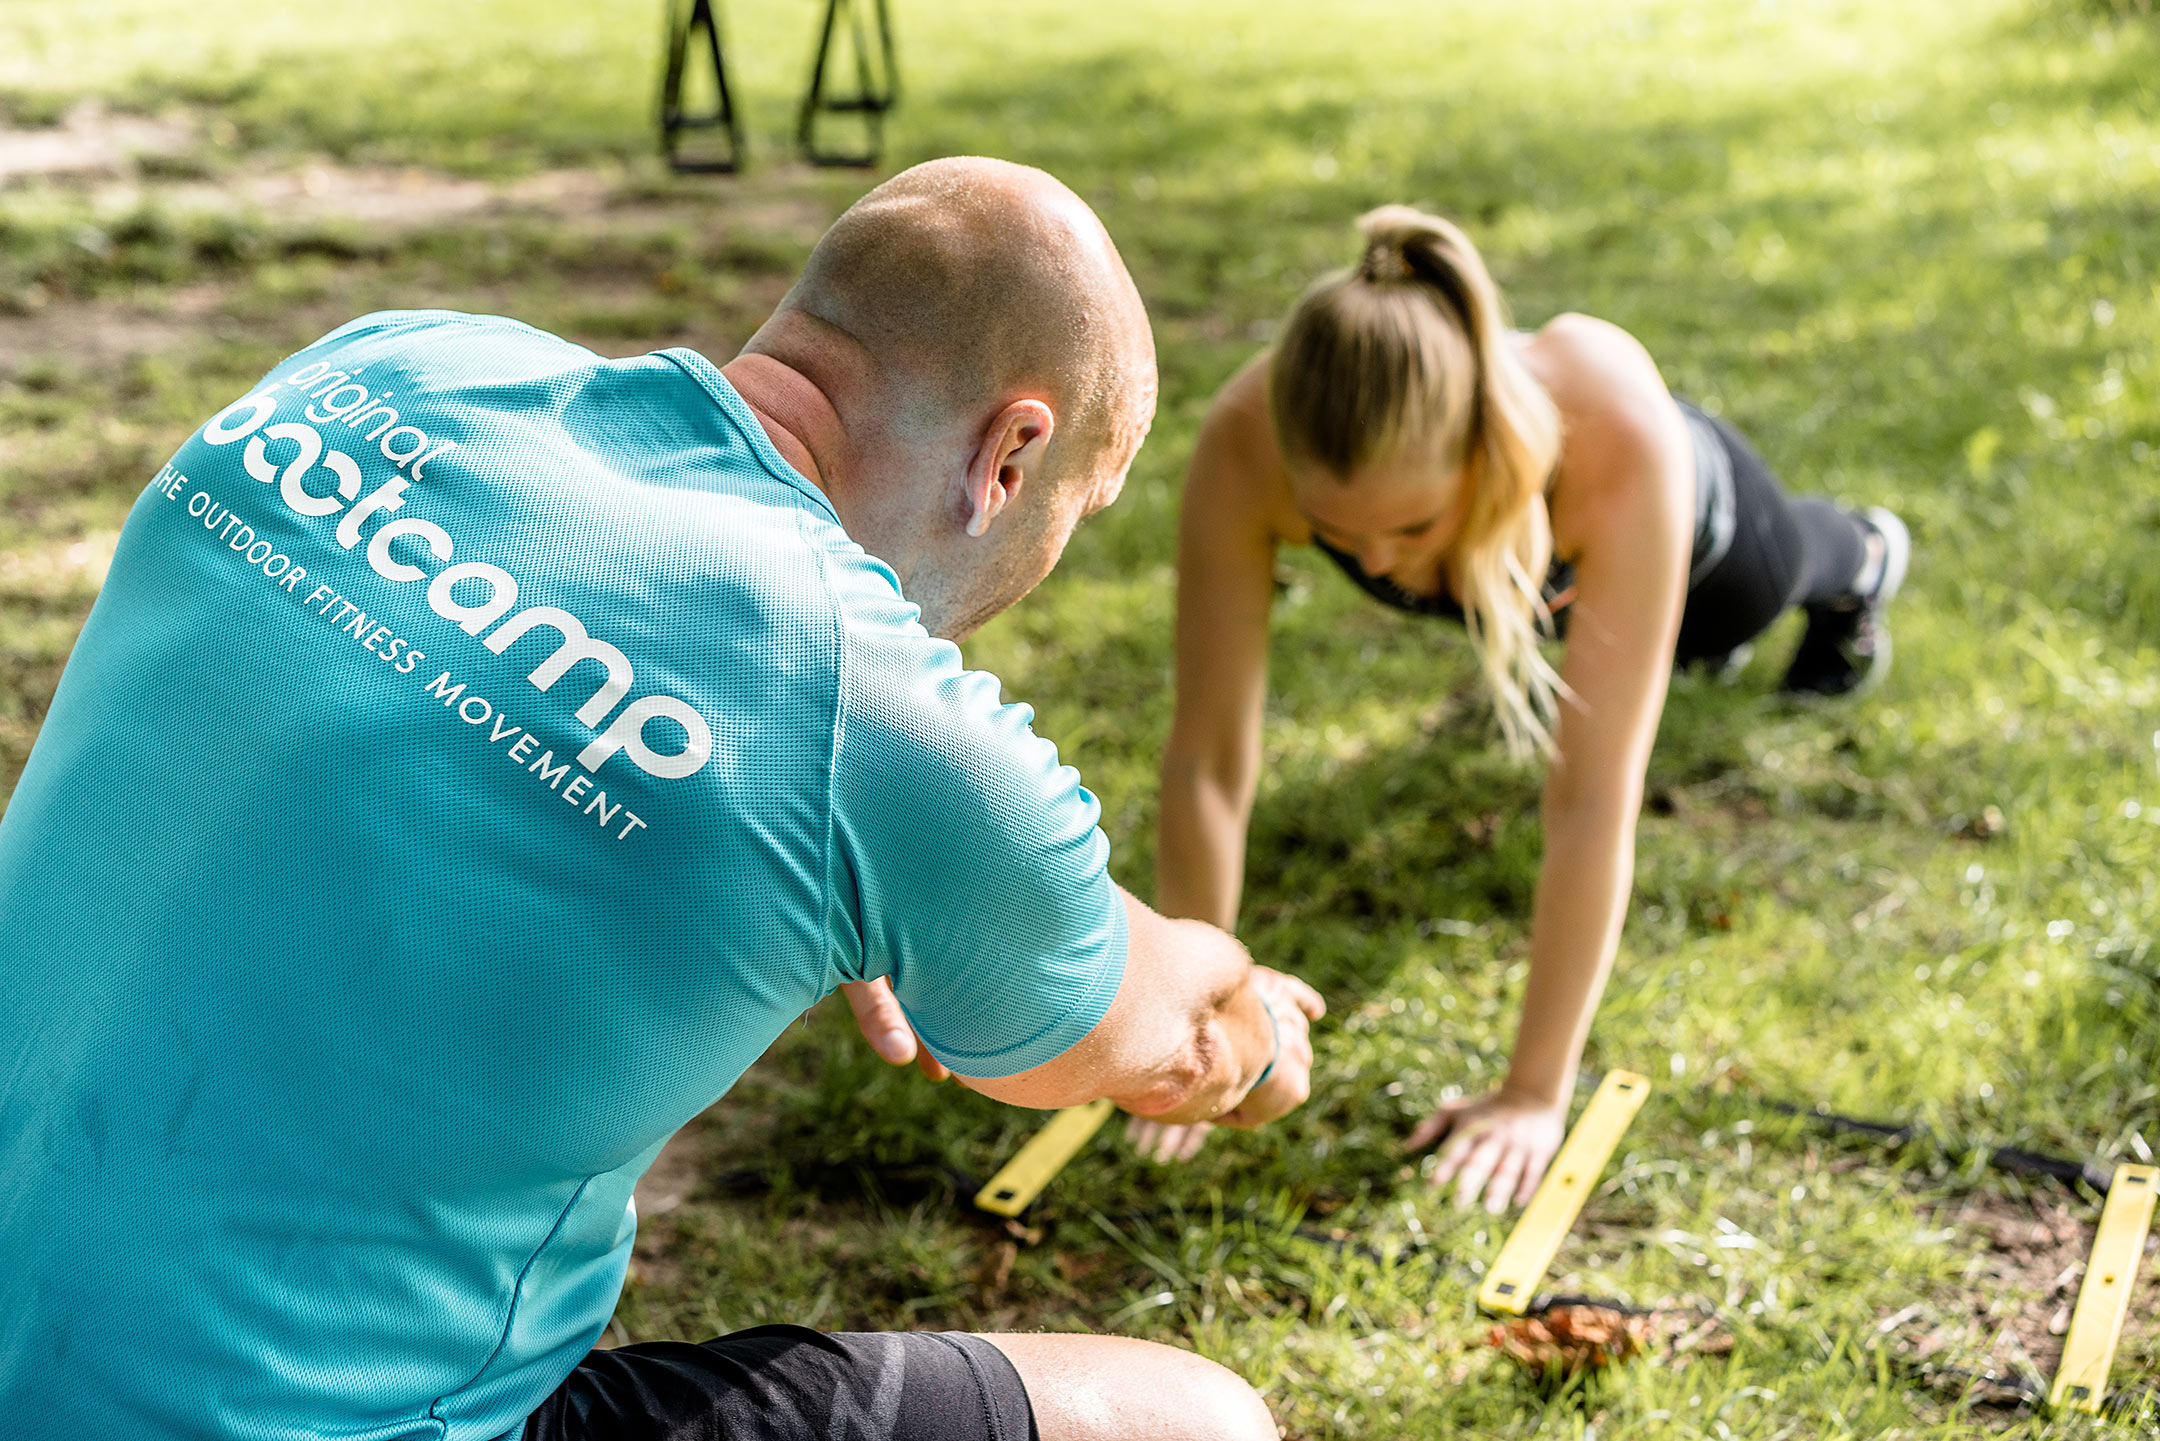 Original Bootcamp Düsseldorf Trainer Fitness Blog Sunnyinga